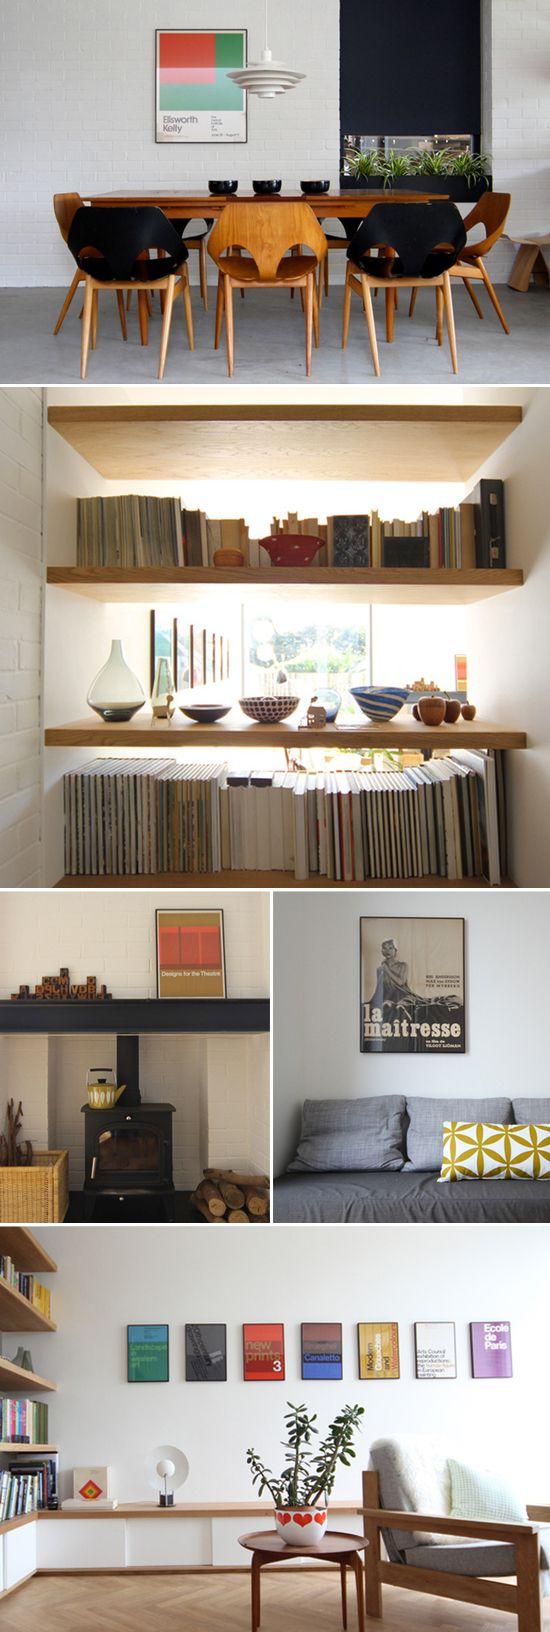 Cuccia Cane Grande Ikea 67 best kathryn tyler images | house design, grand designs